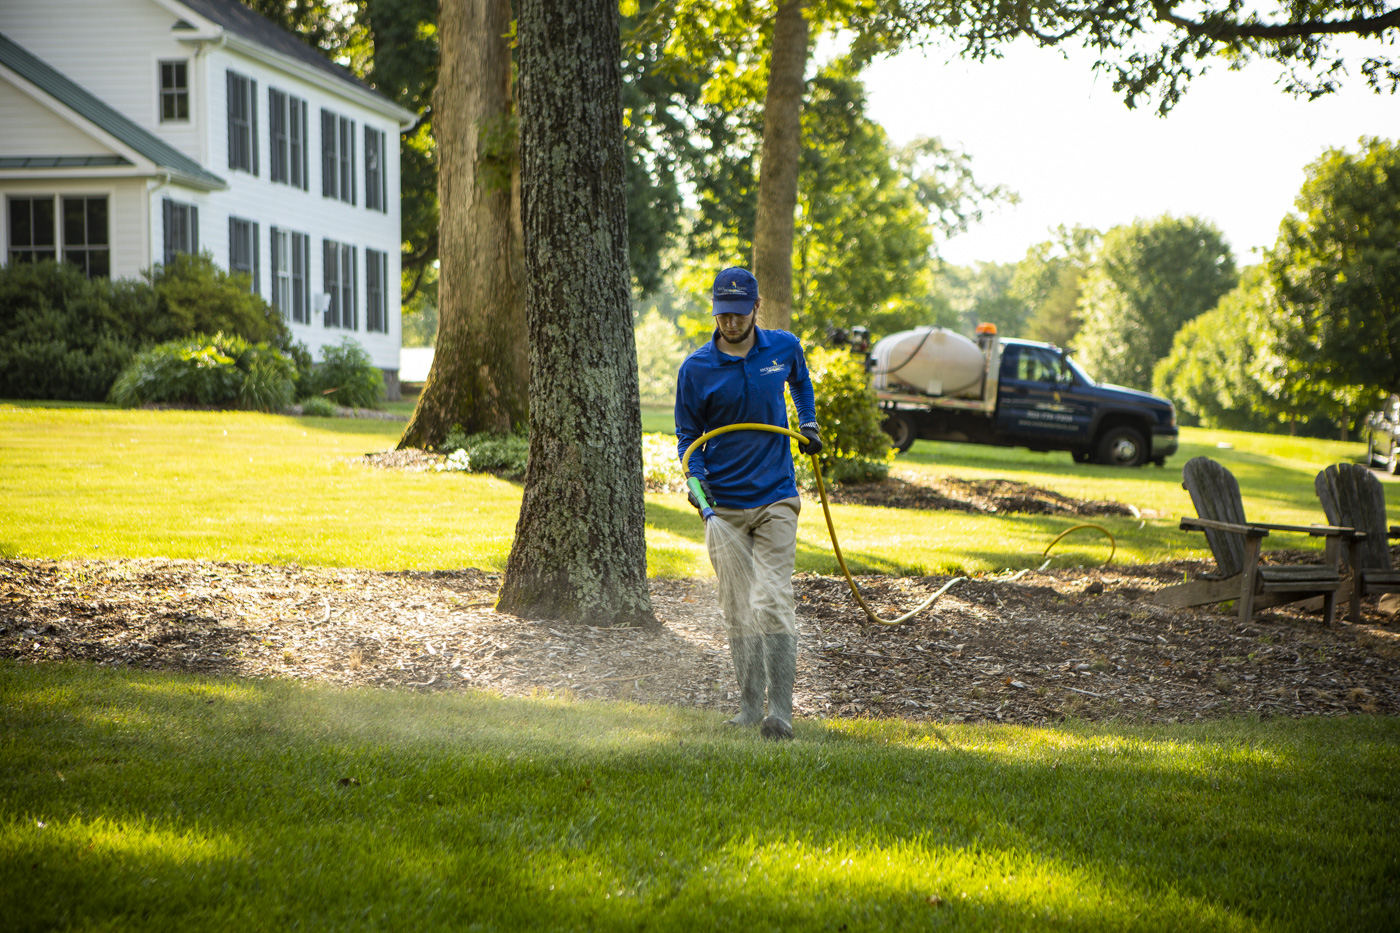 Rock Water Farm lawn care technician spraying lawn in Ashburn, VA